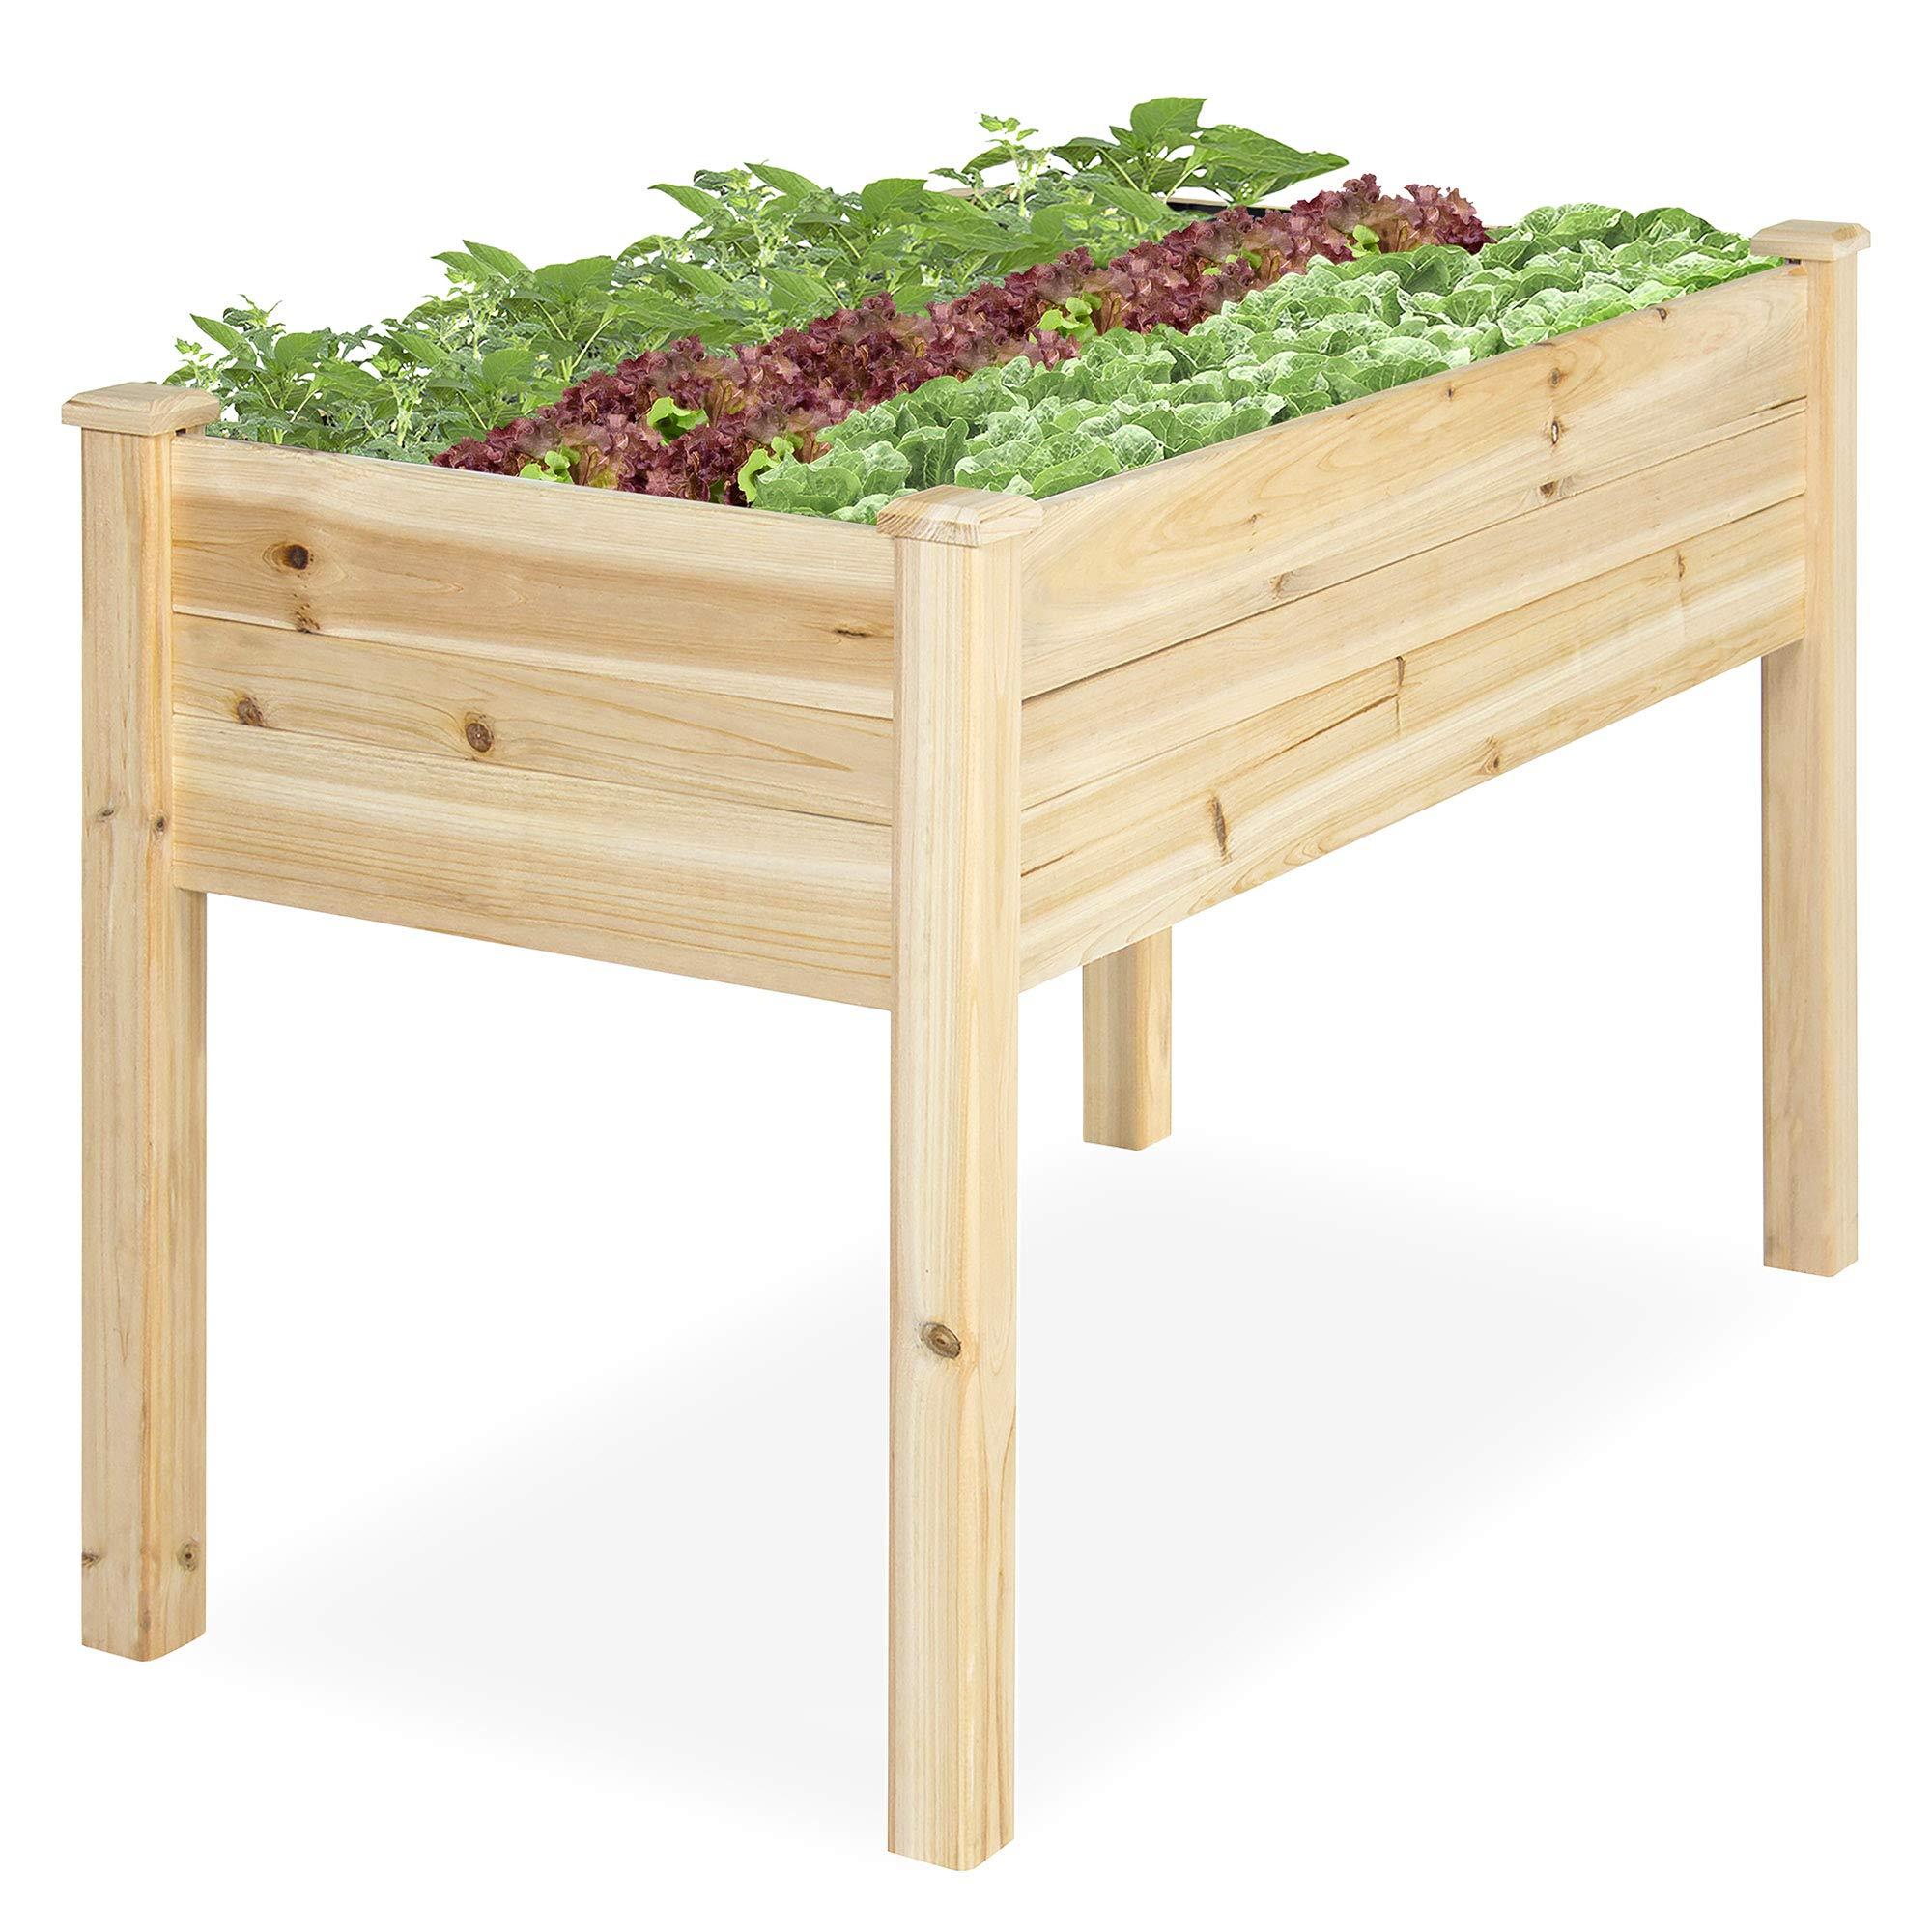 Elevated Planter Box Kit for Backyard Patio Balcony 47 x 23 x 30 ...